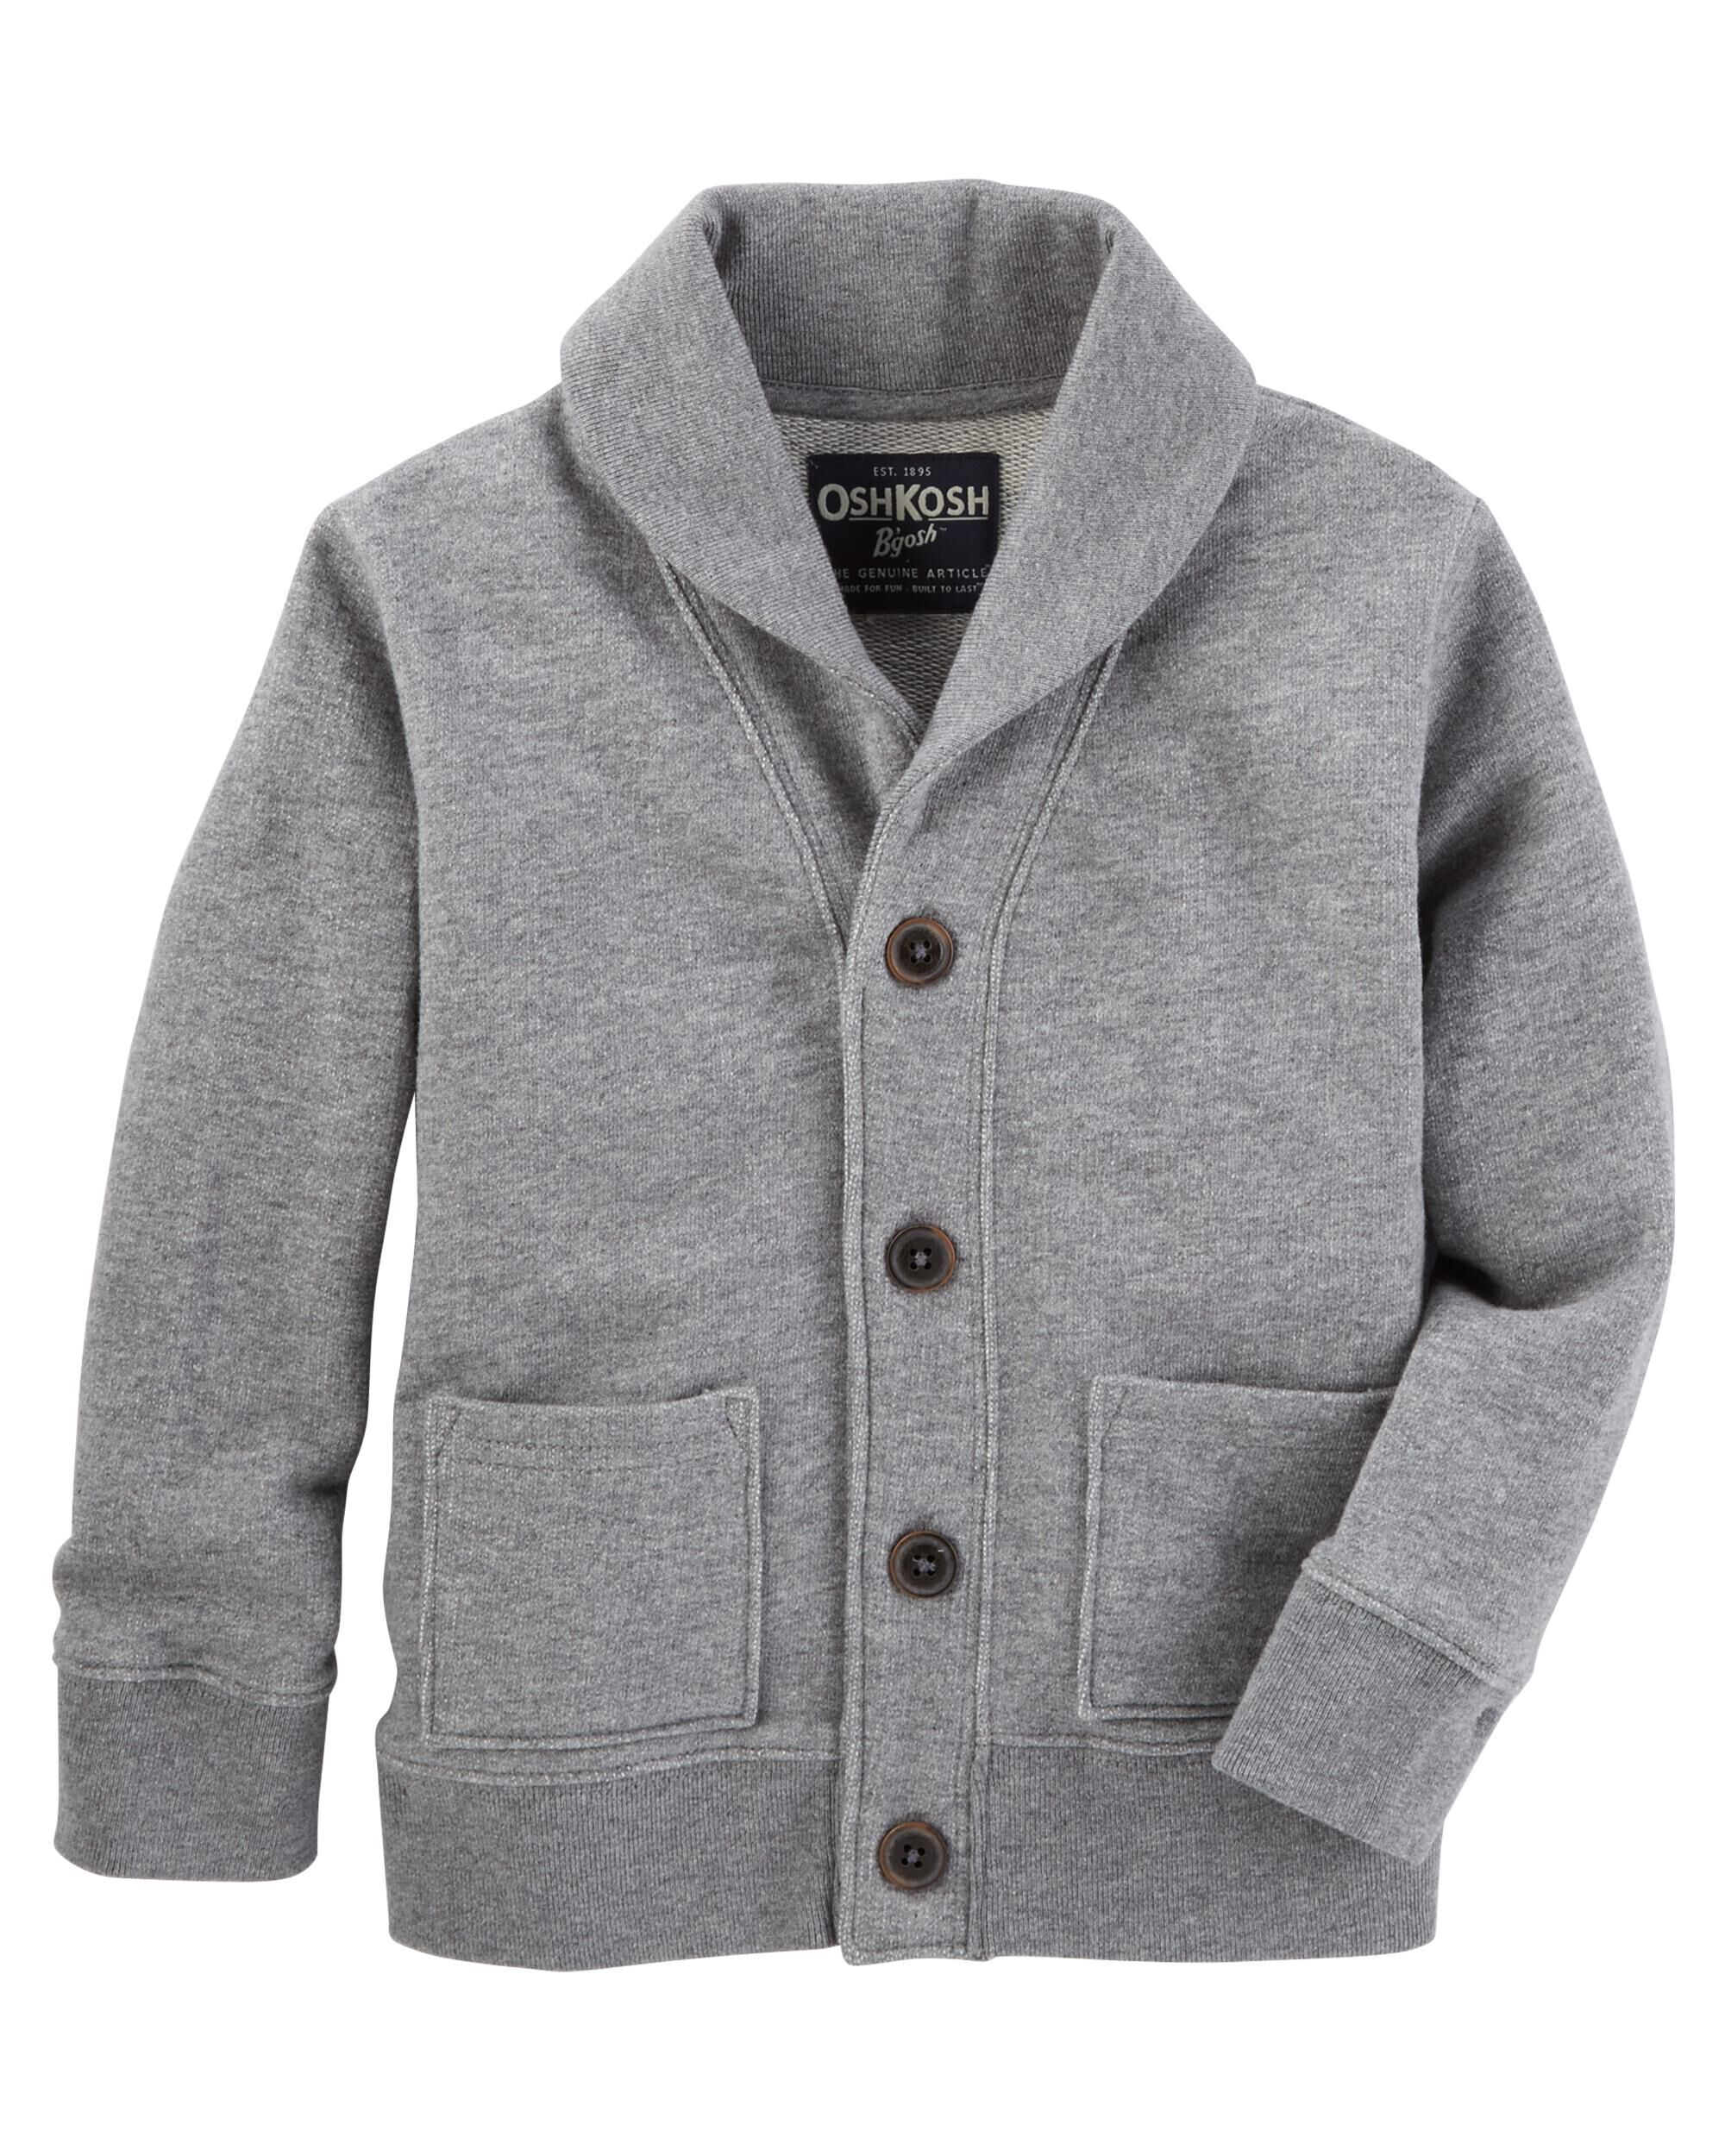 Boys Sweaters | Oshkosh | Free Shipping